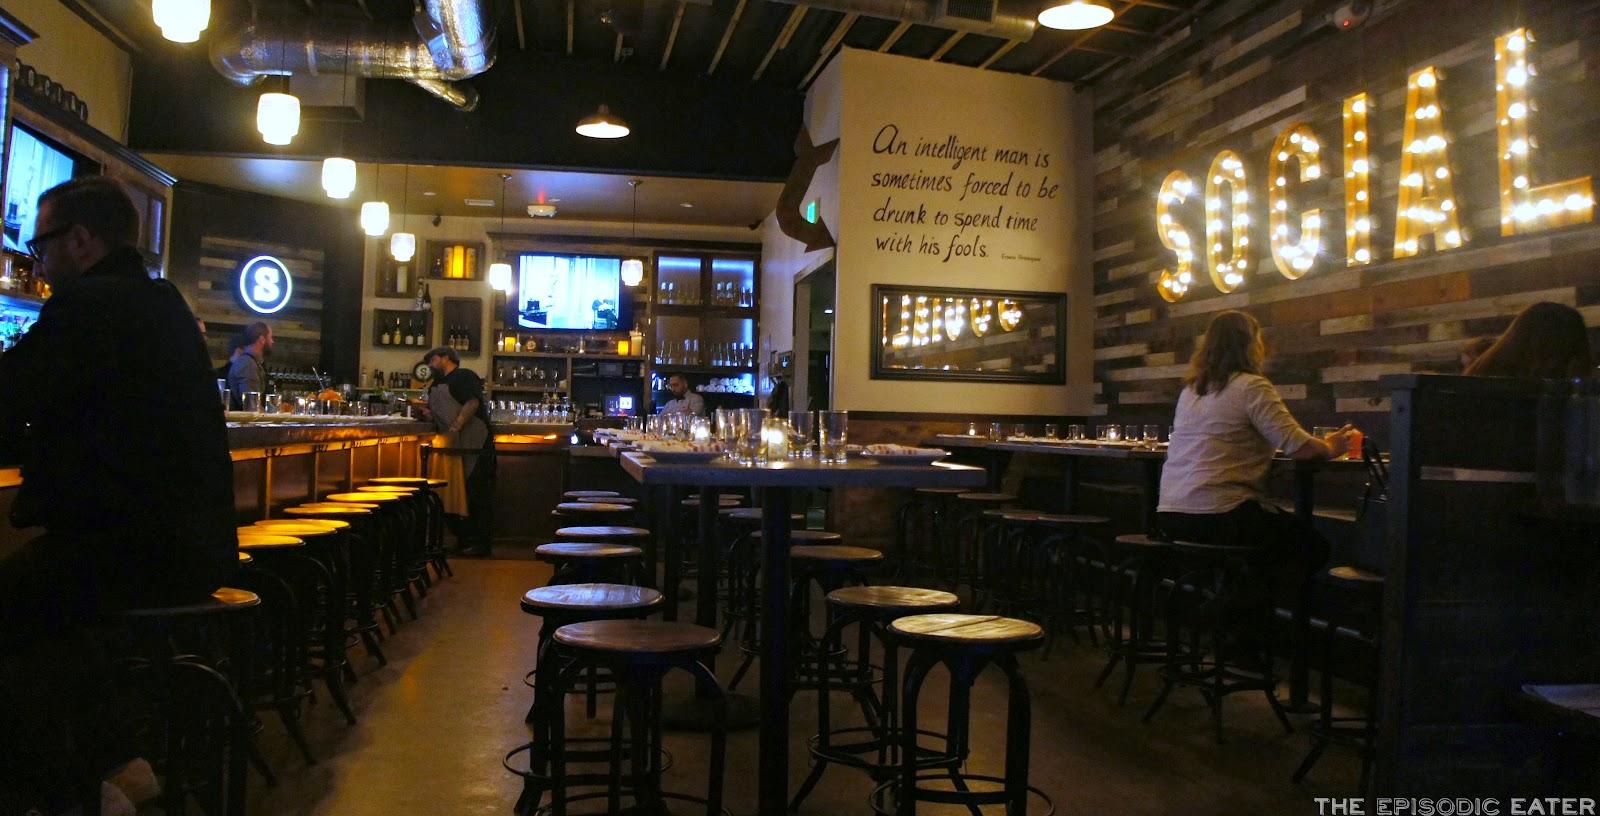 SOCIAL (Costa Mesa, CA) + New Dessert Program! on the Episodic Eater